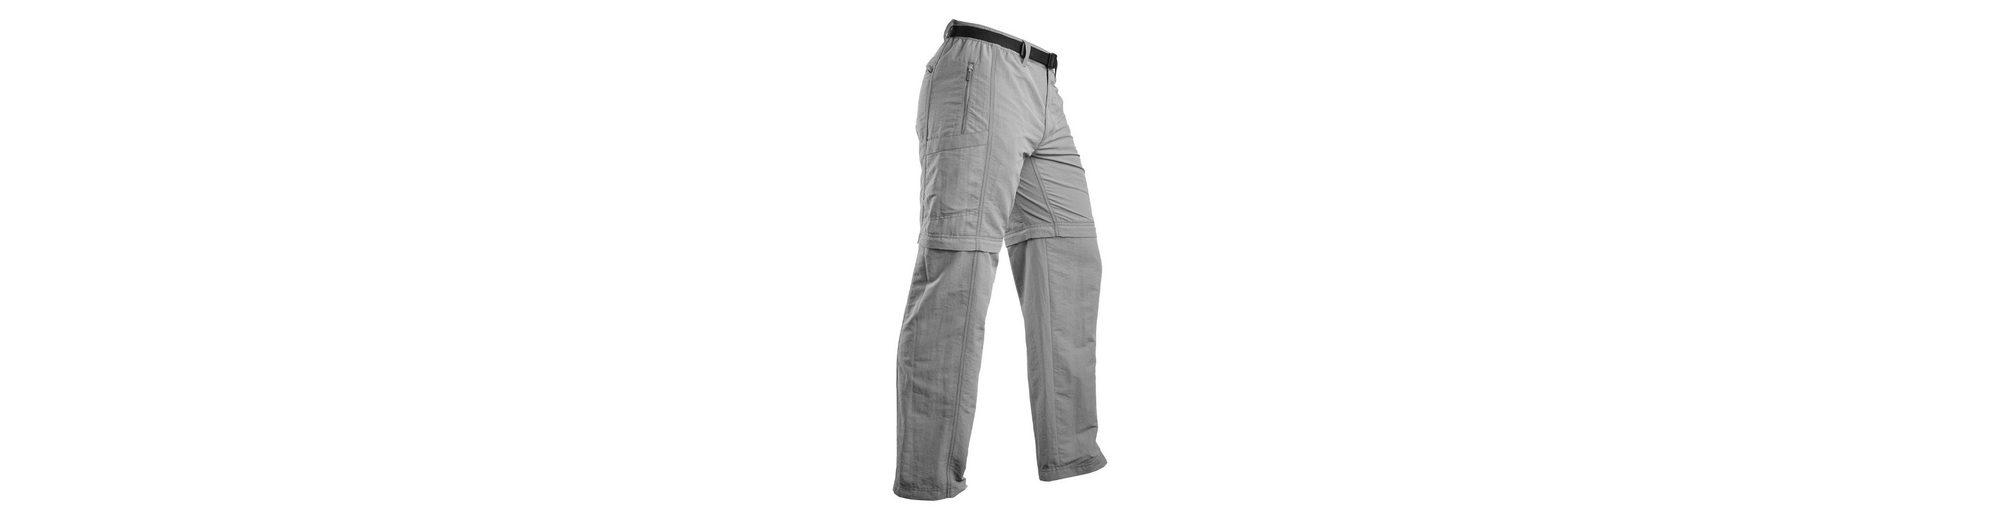 Kathmandu Zip Off Wanderhose Clarke Gut Verkaufen 9GD85nkE